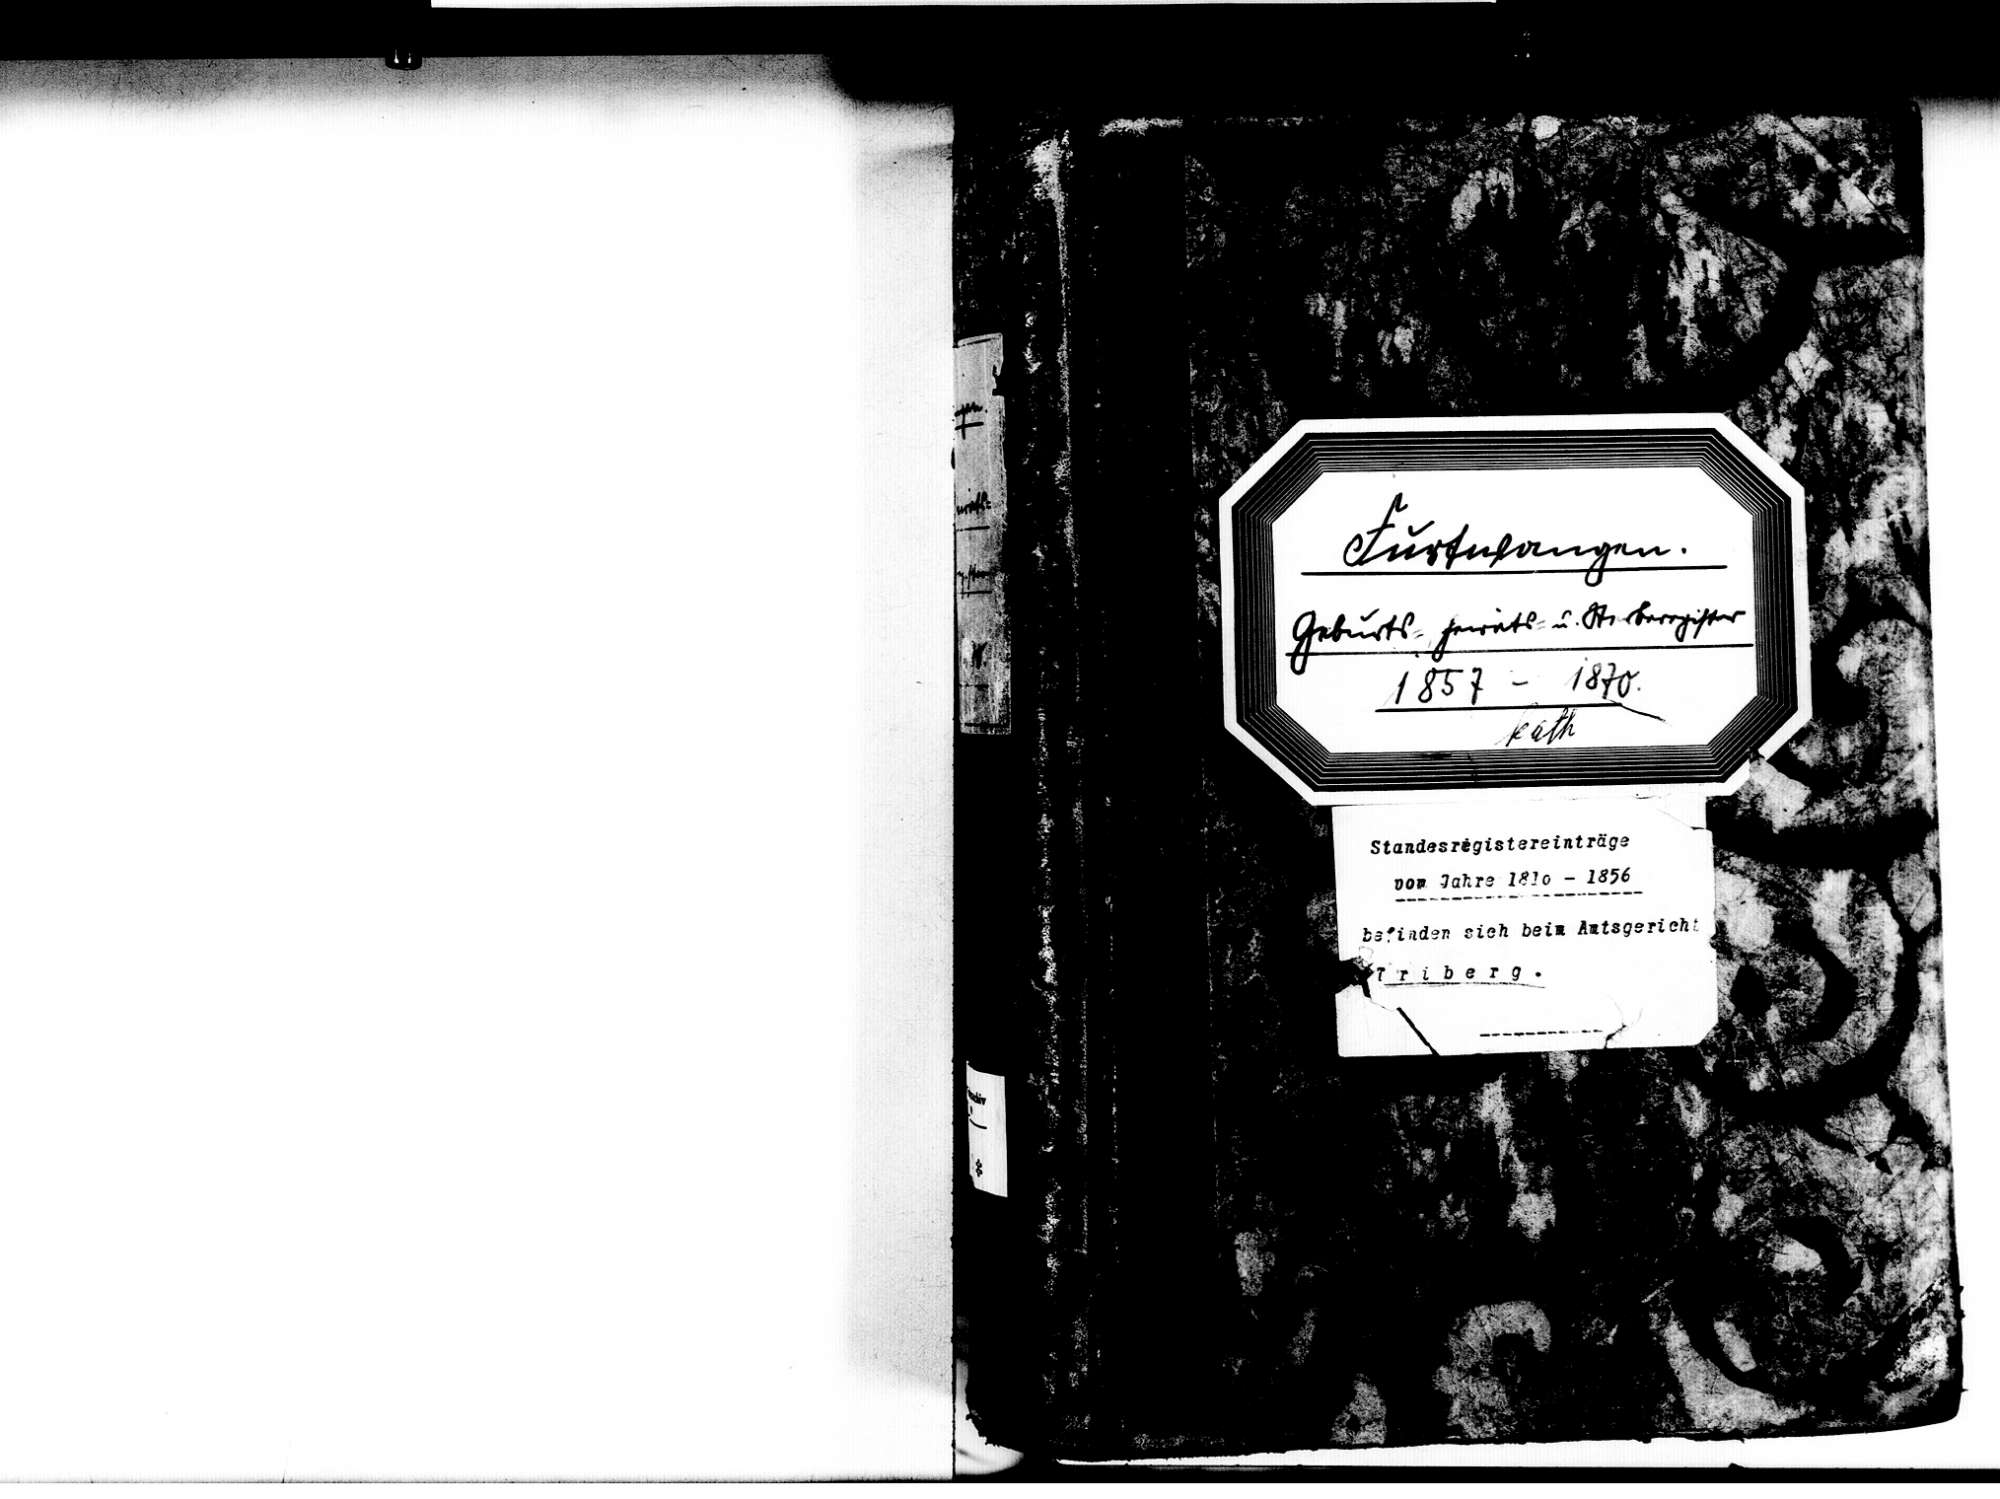 Furtwangen VS; Katholische Gemeinde: Standesbuch 1857-1870, Bild 3